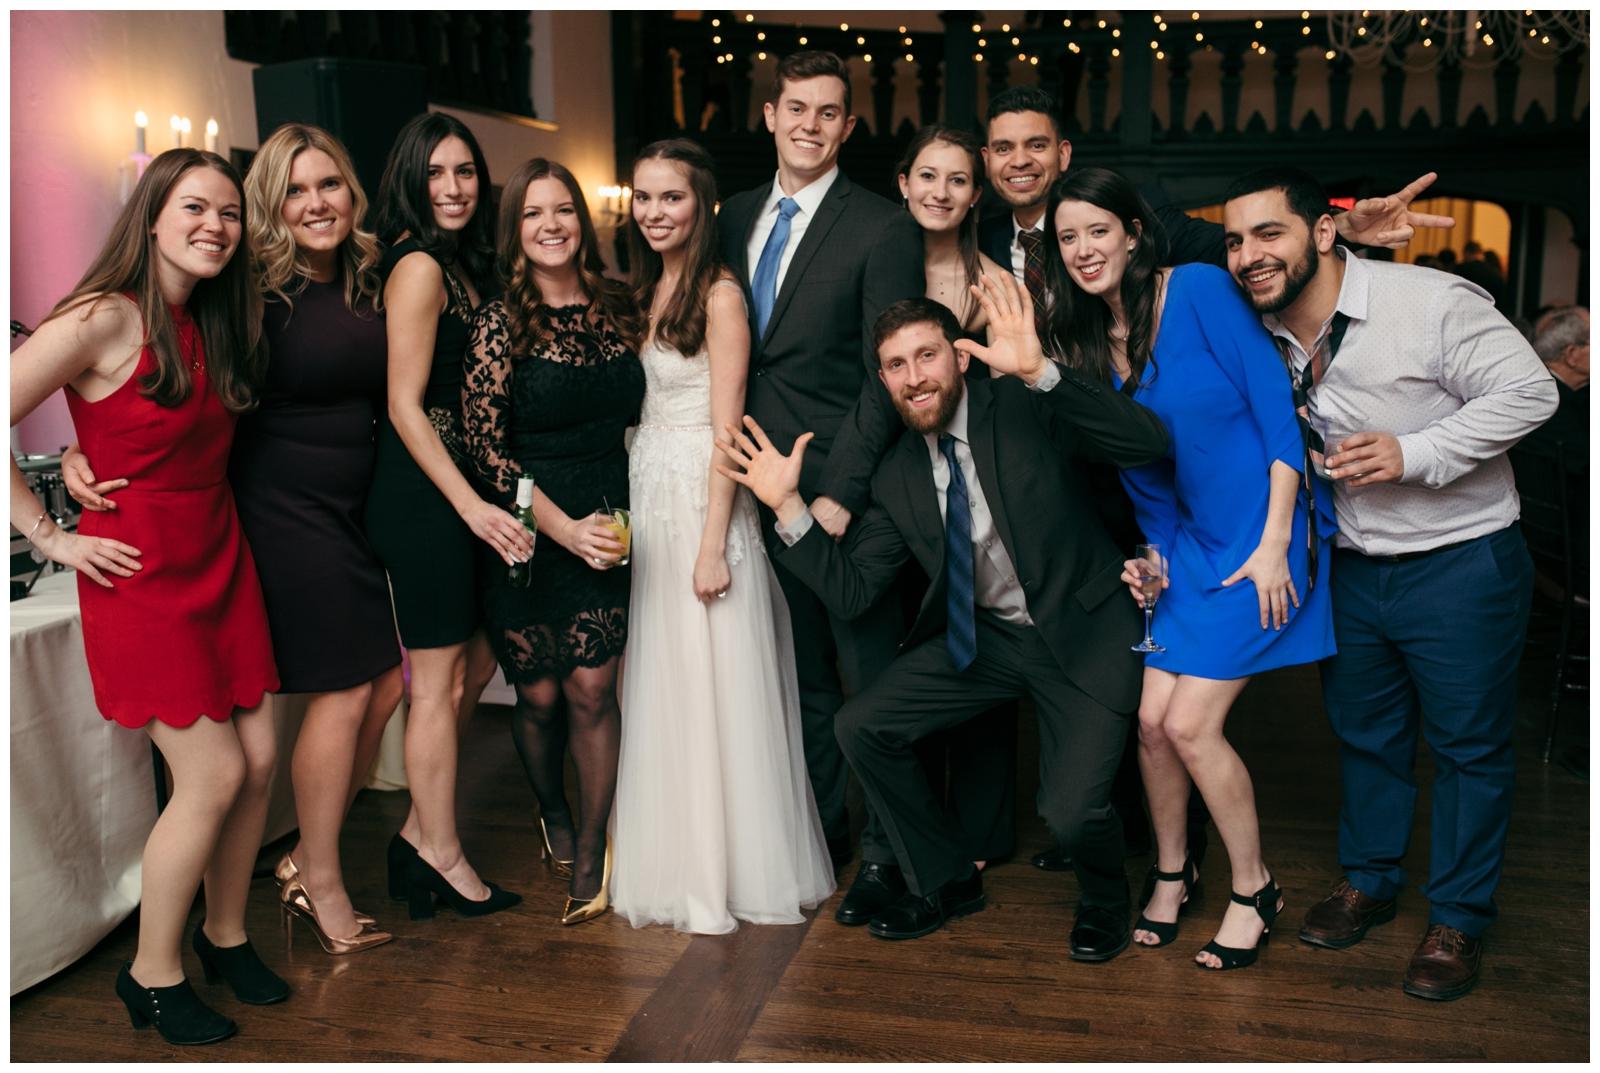 Alden-Castle-Wedding-Boston-Bailey-Q-Photo-070.jpg